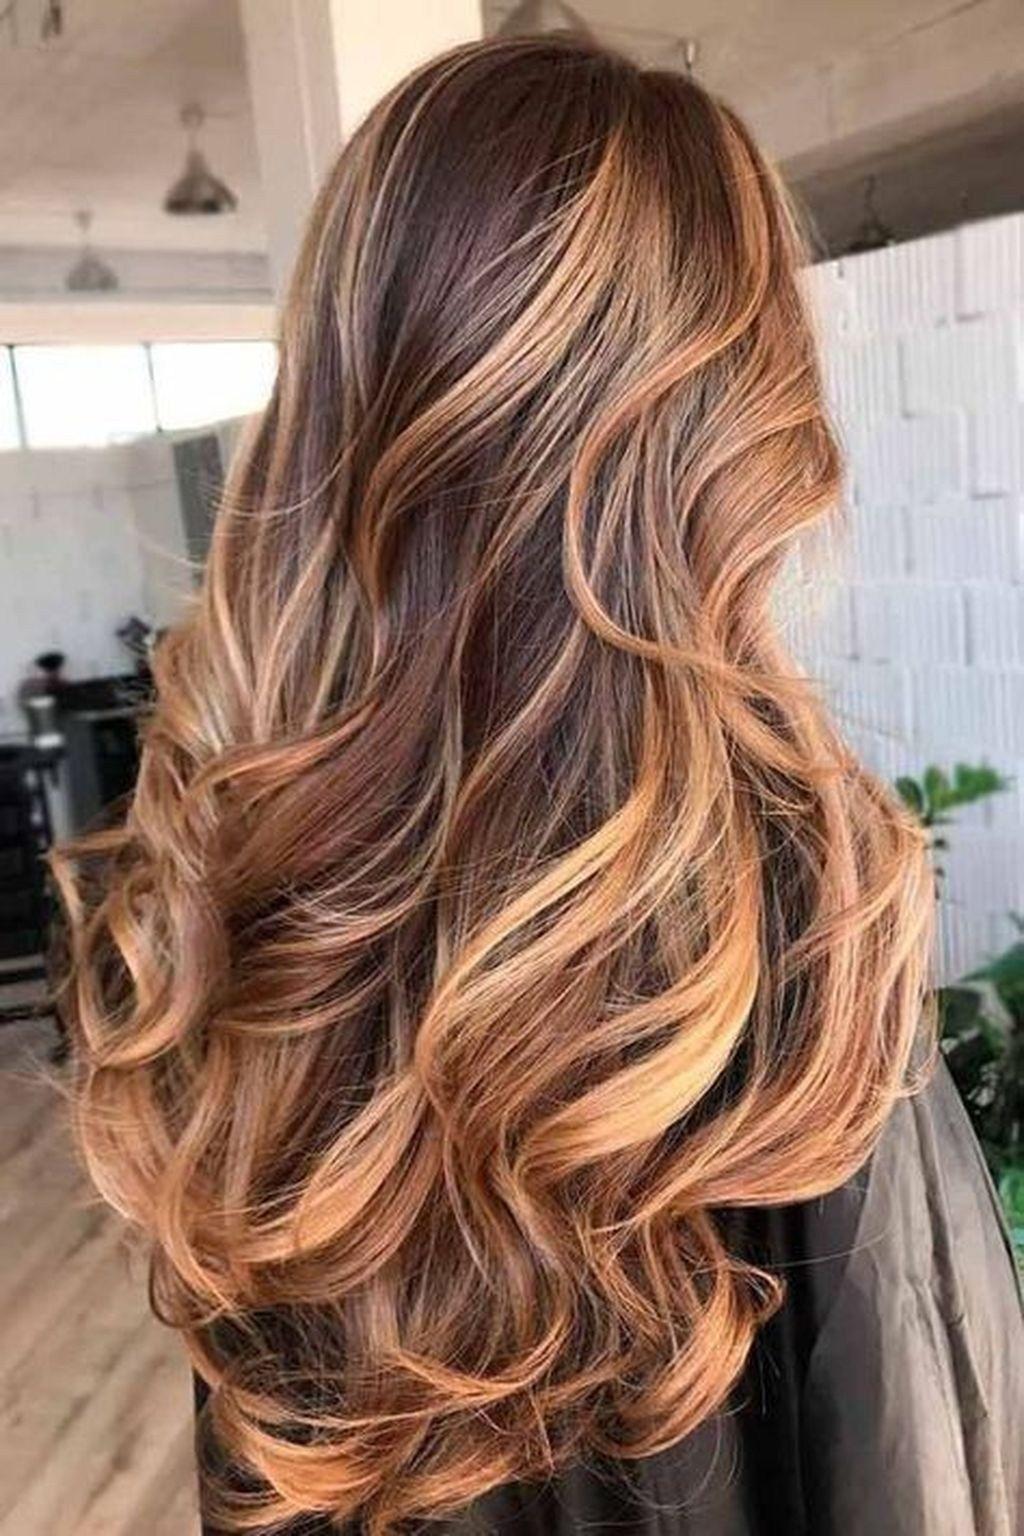 Herrliche Frühlings-Haar-Farbideen Für Brunette #fallhaircolorforbrunettes